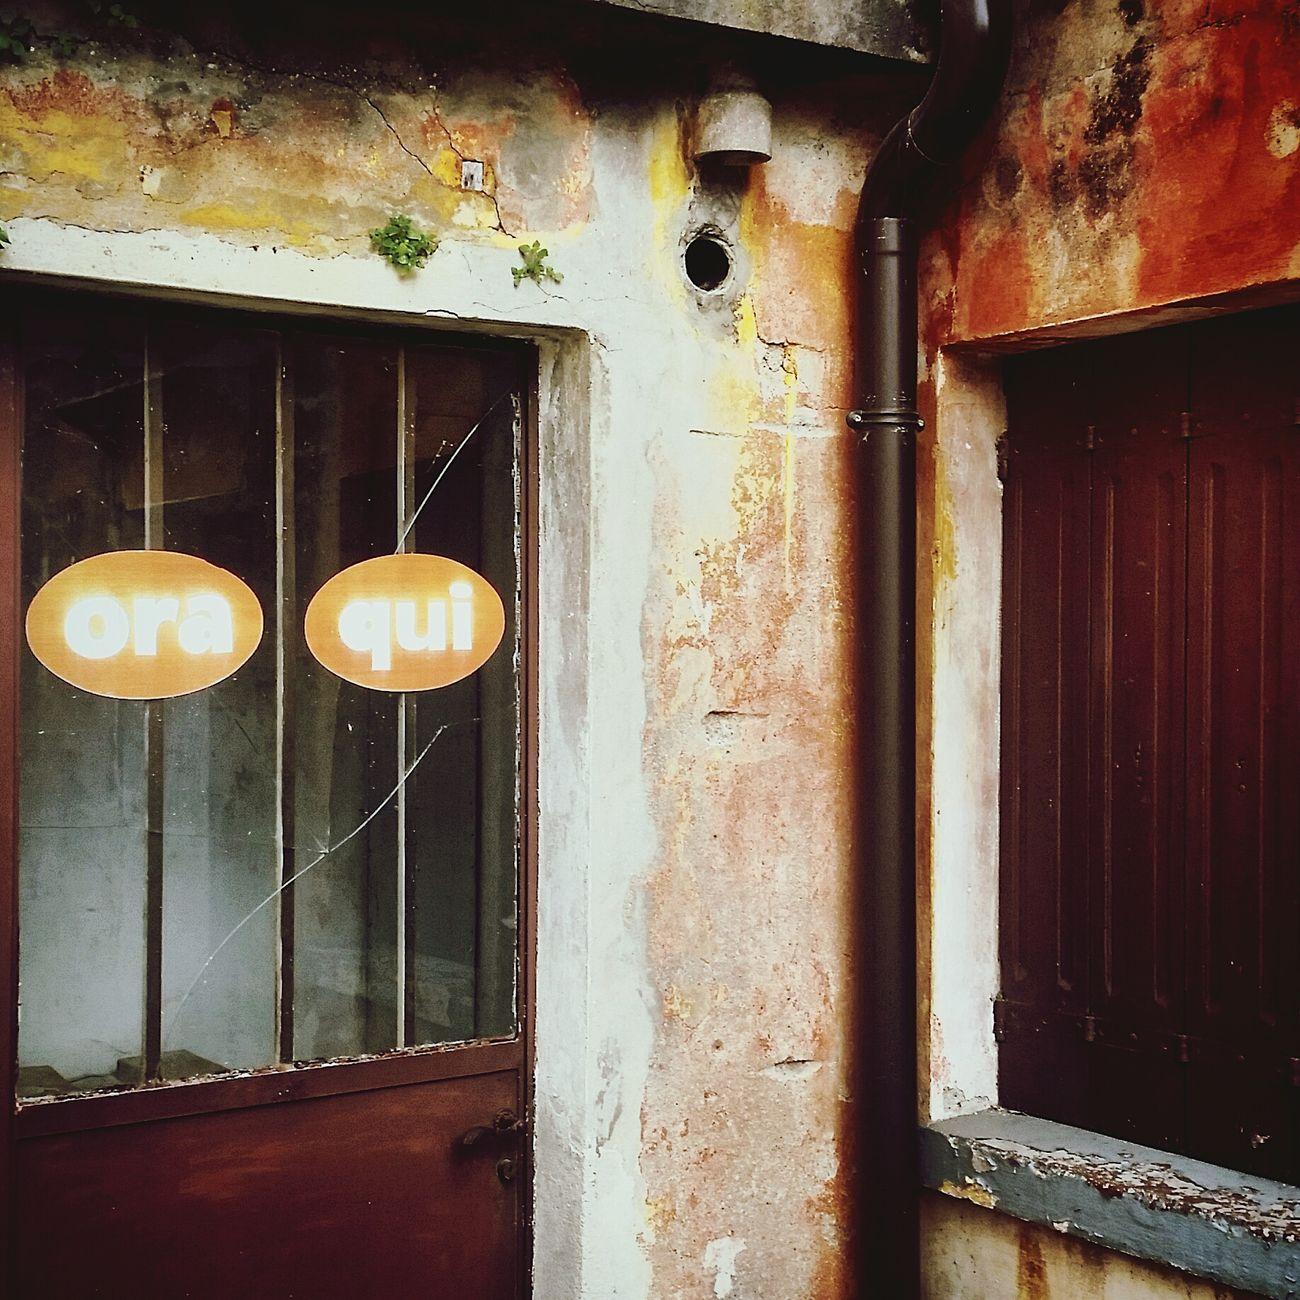 Hic Et Nunc Pordenone Notes From The Underground Cityscape Pasqualino